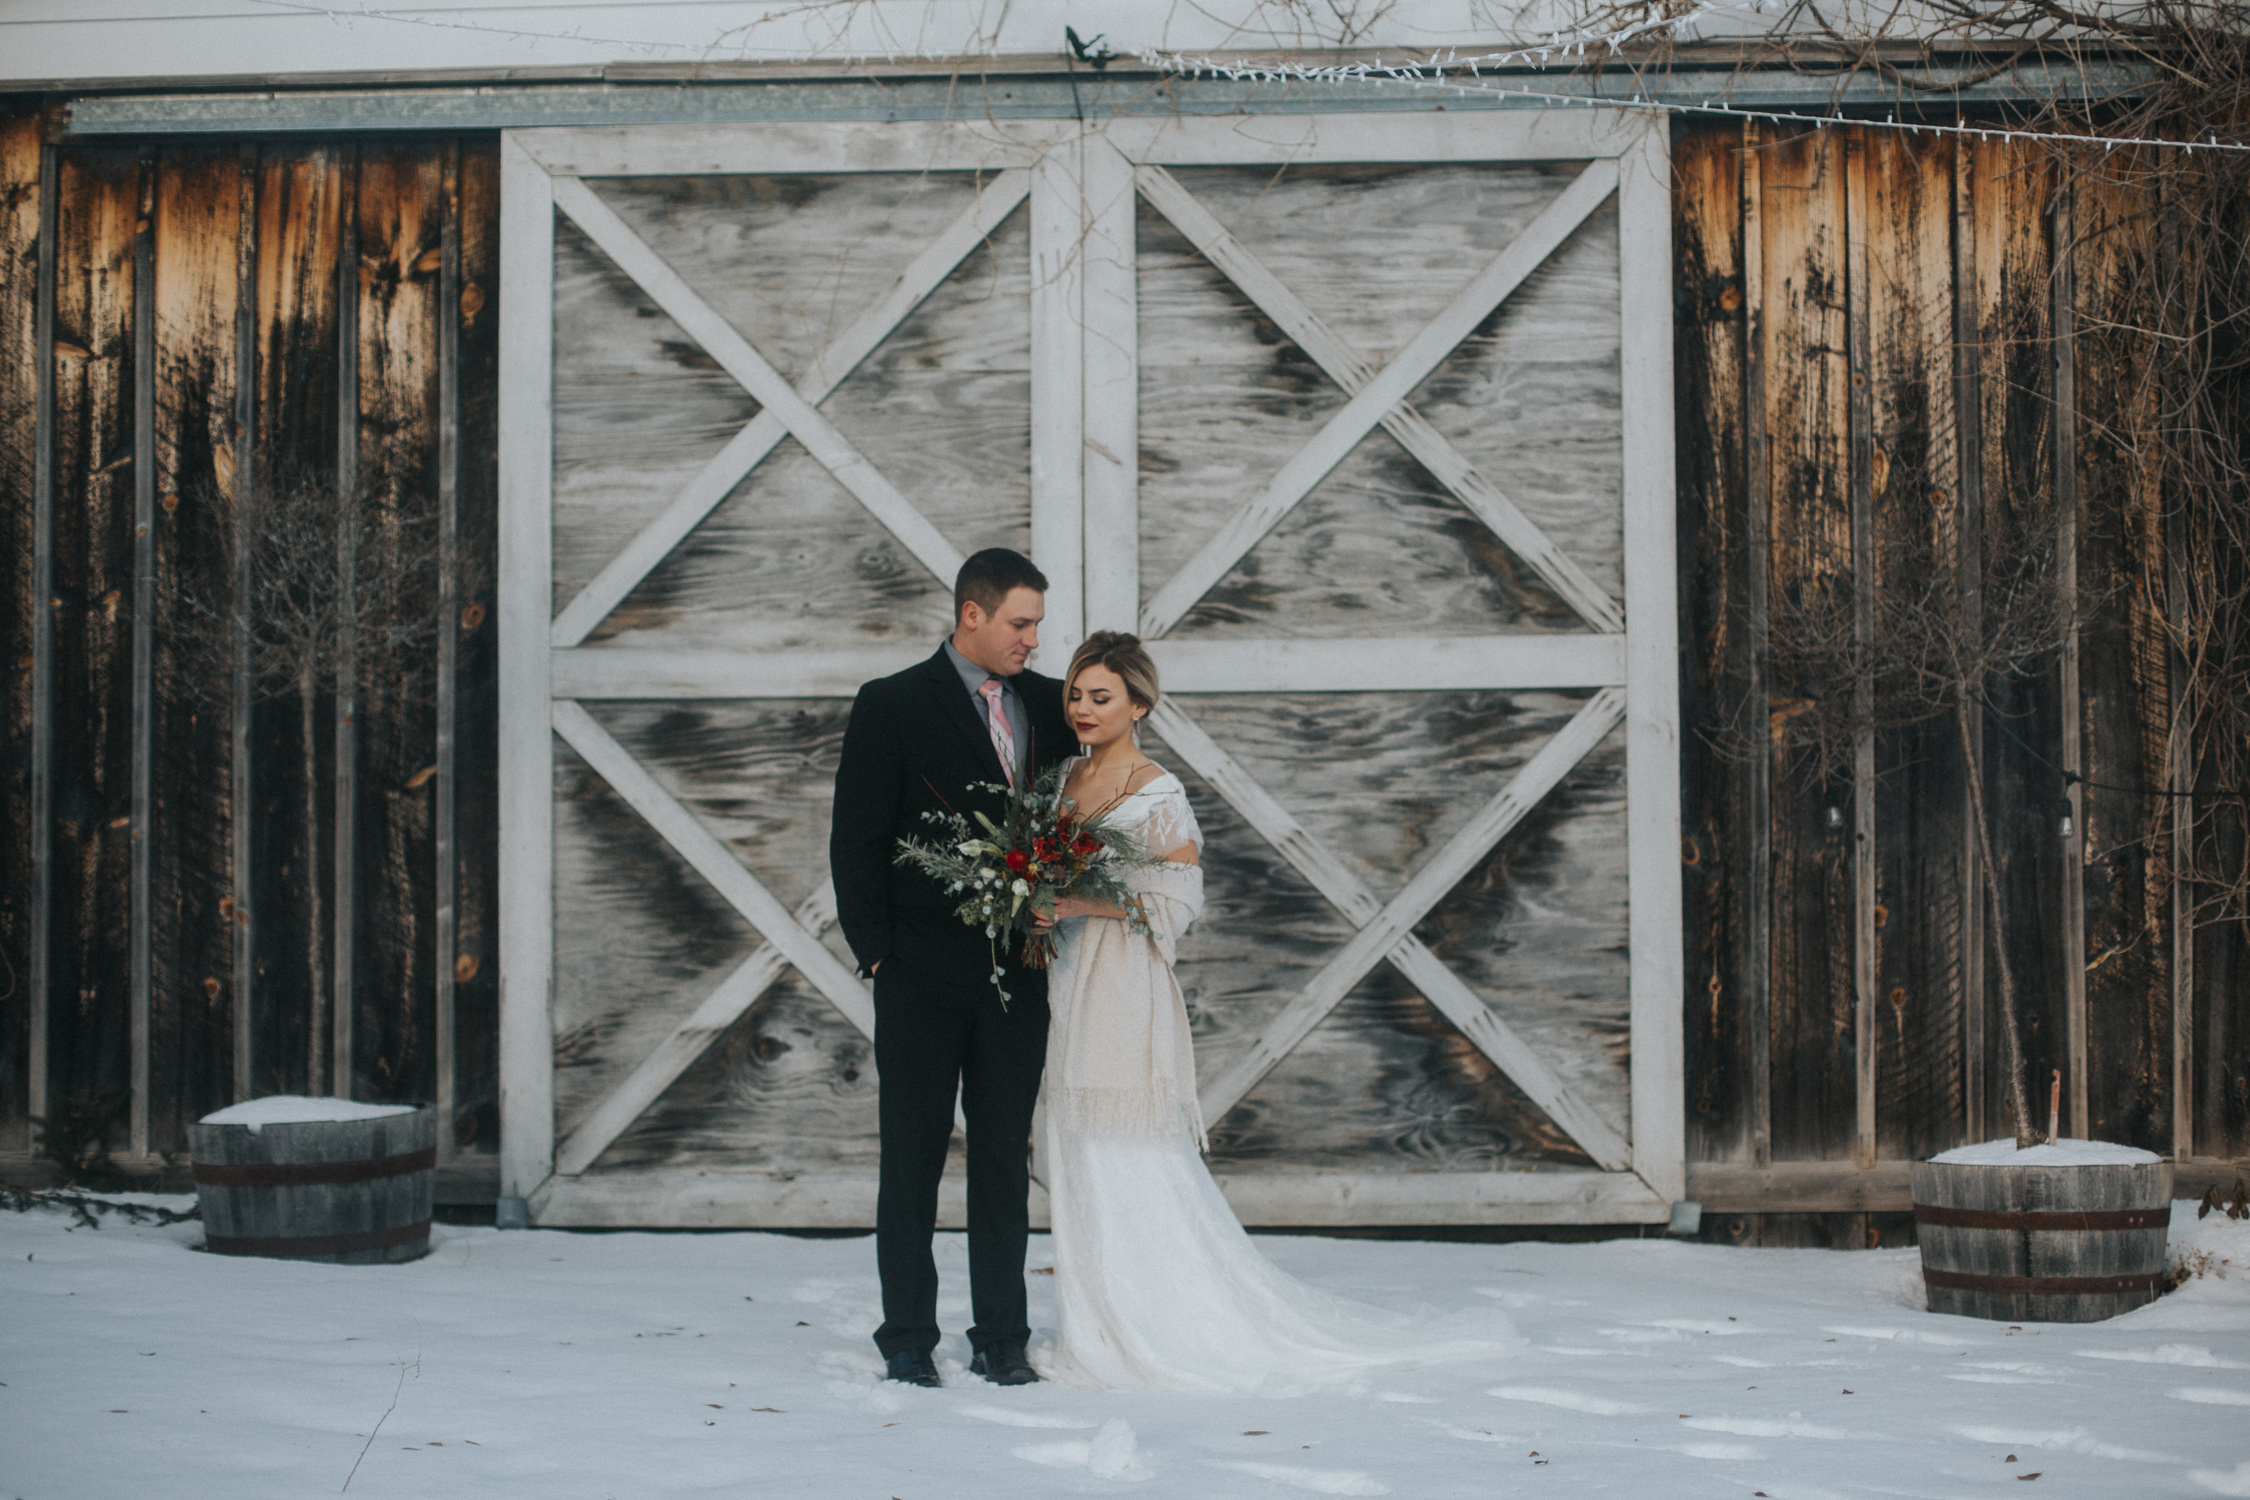 mnd_farm_winter_wedding_005.jpg